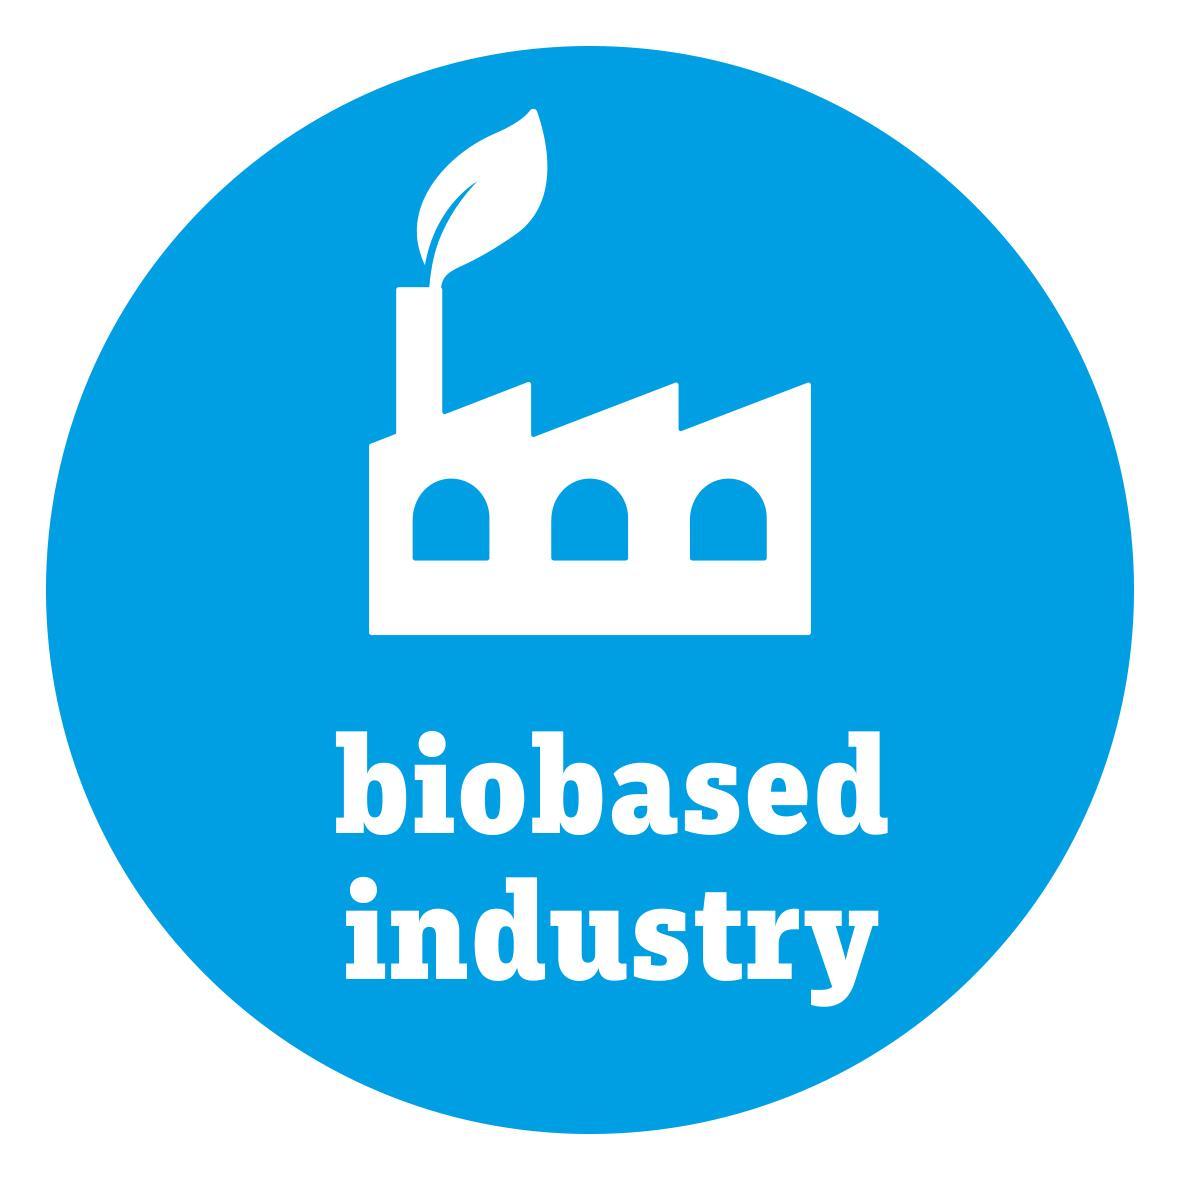 Biobased industry